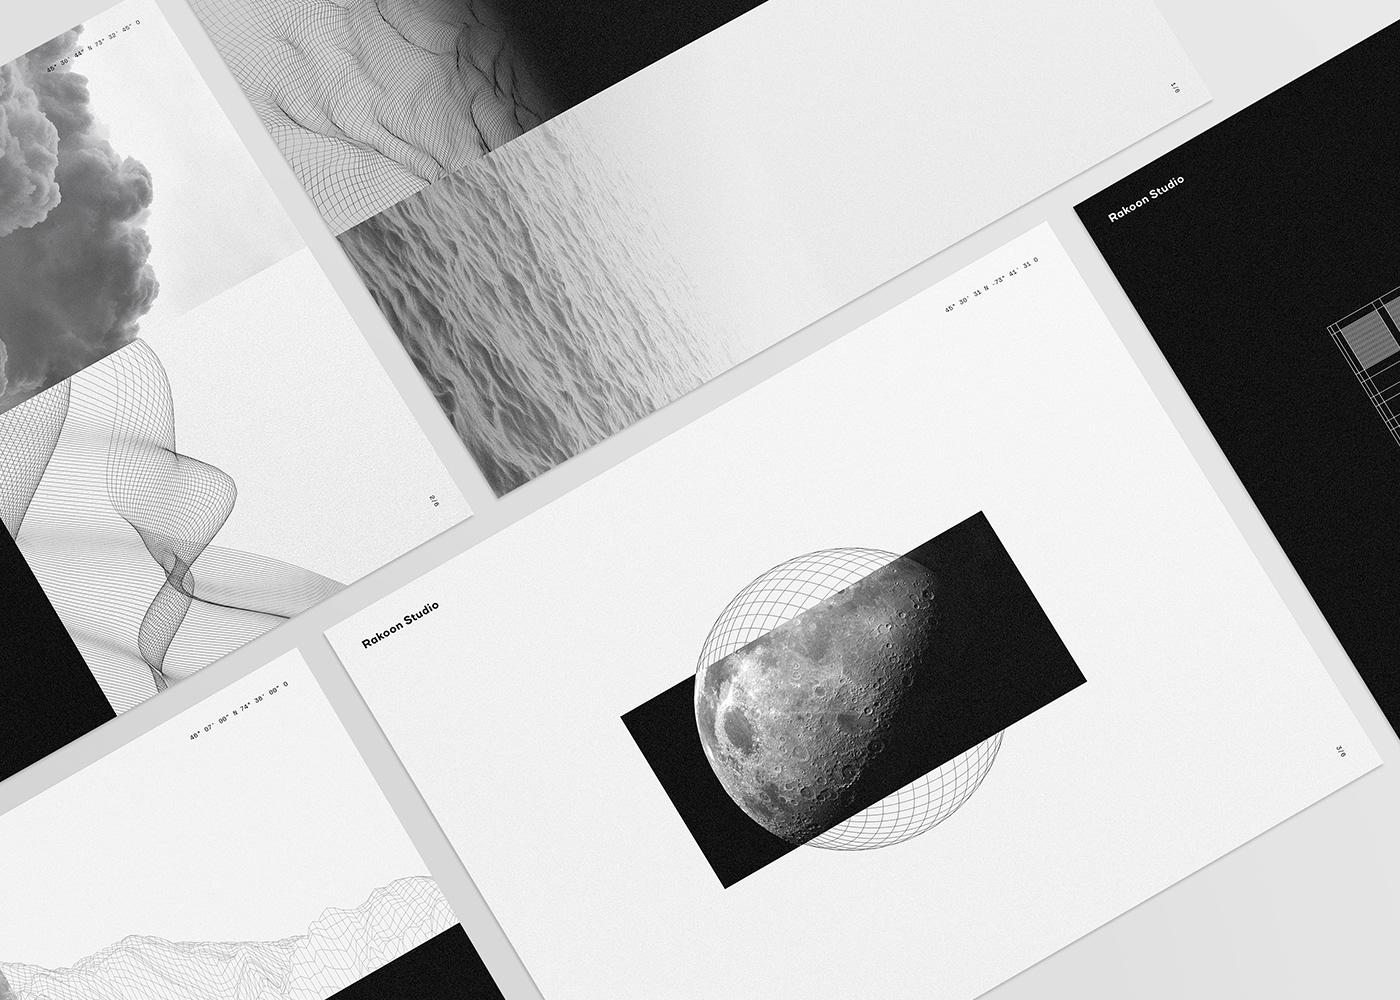 design branding  Virtual reality Immersion graphic design  brand immersive poster